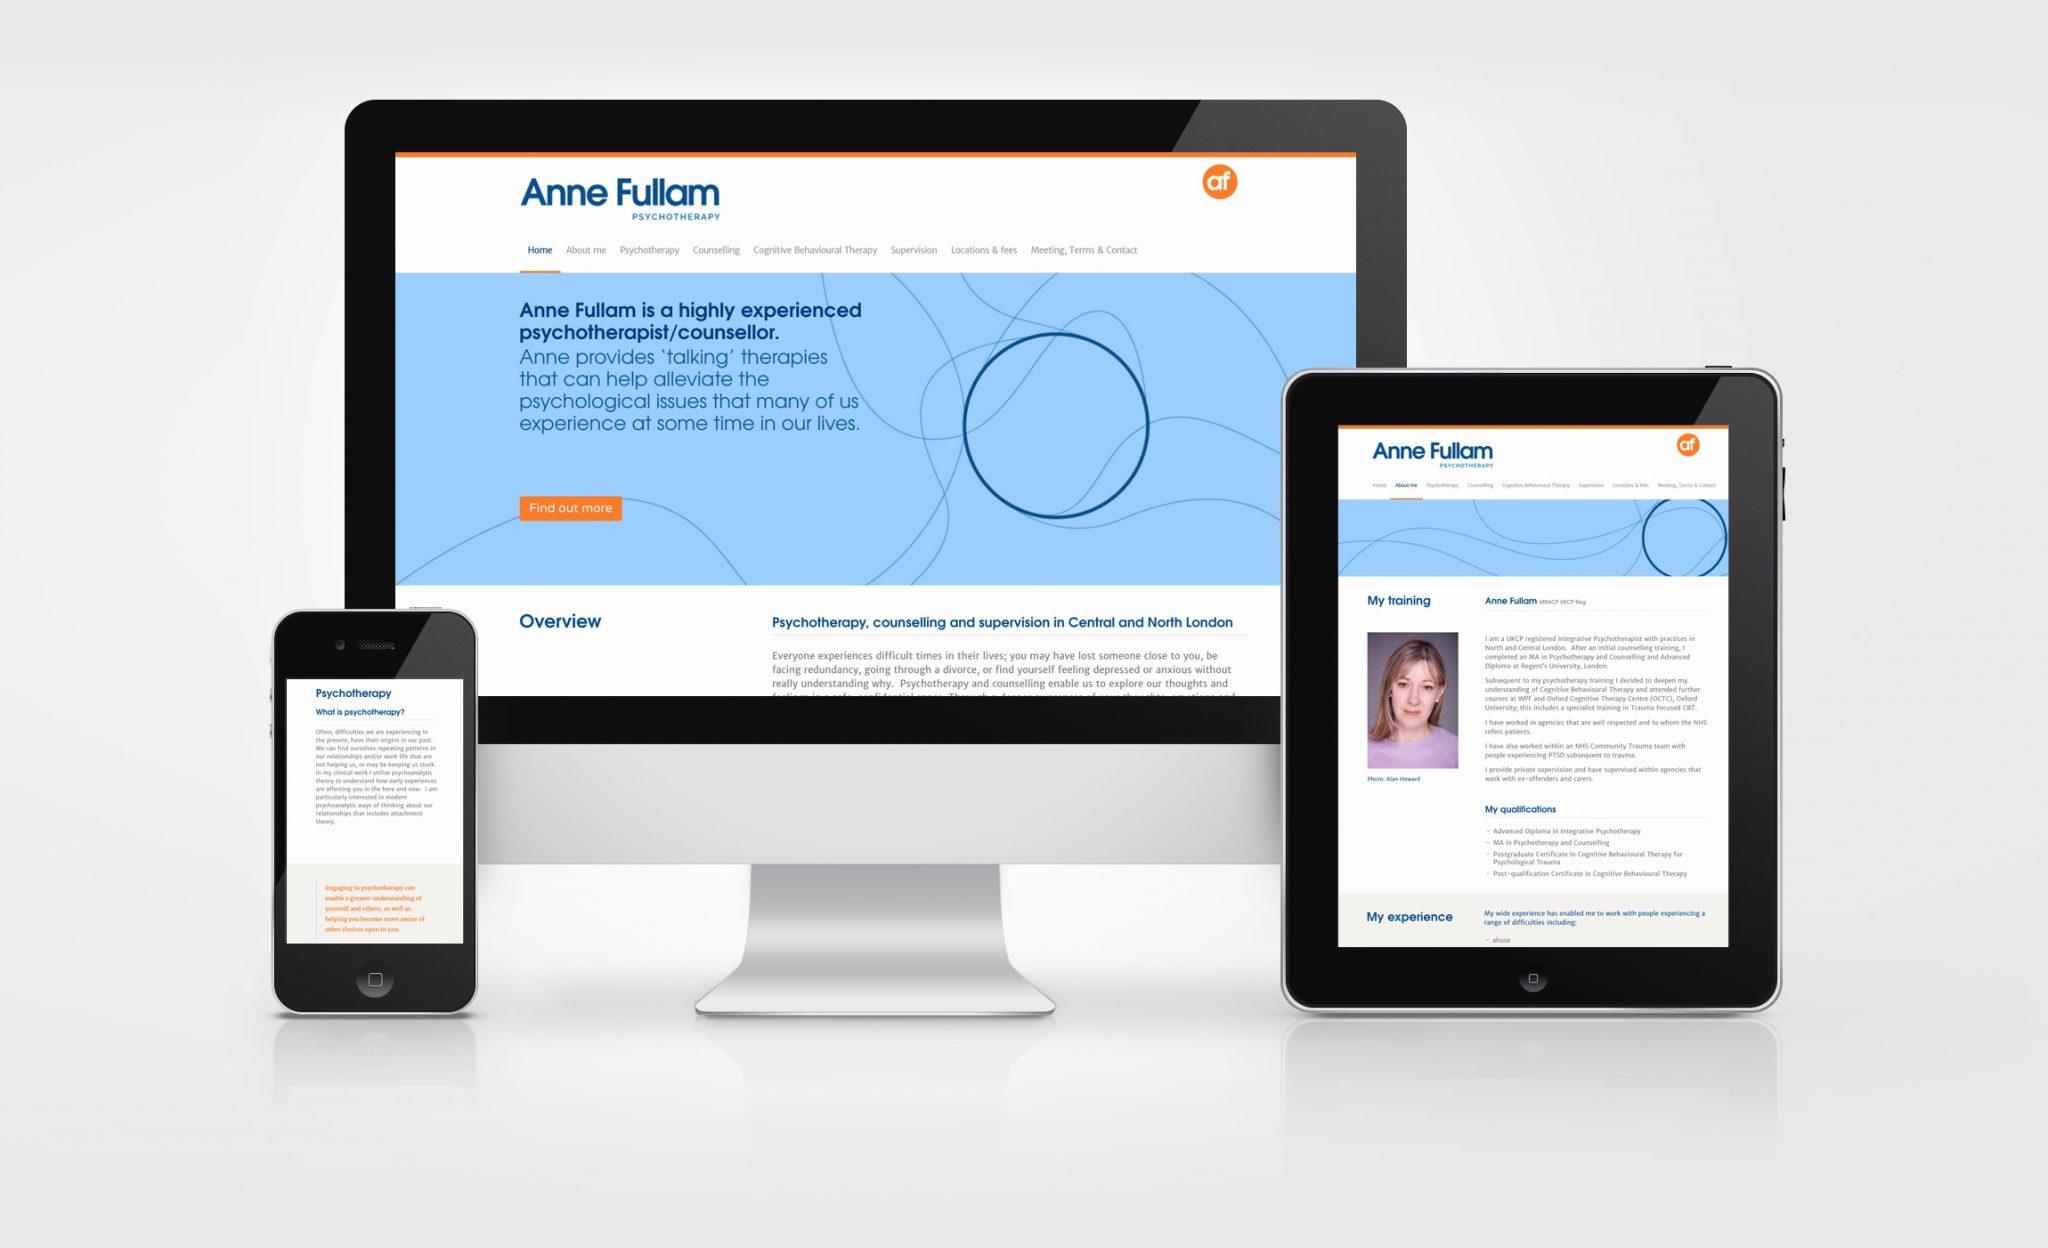 anne fulham website design